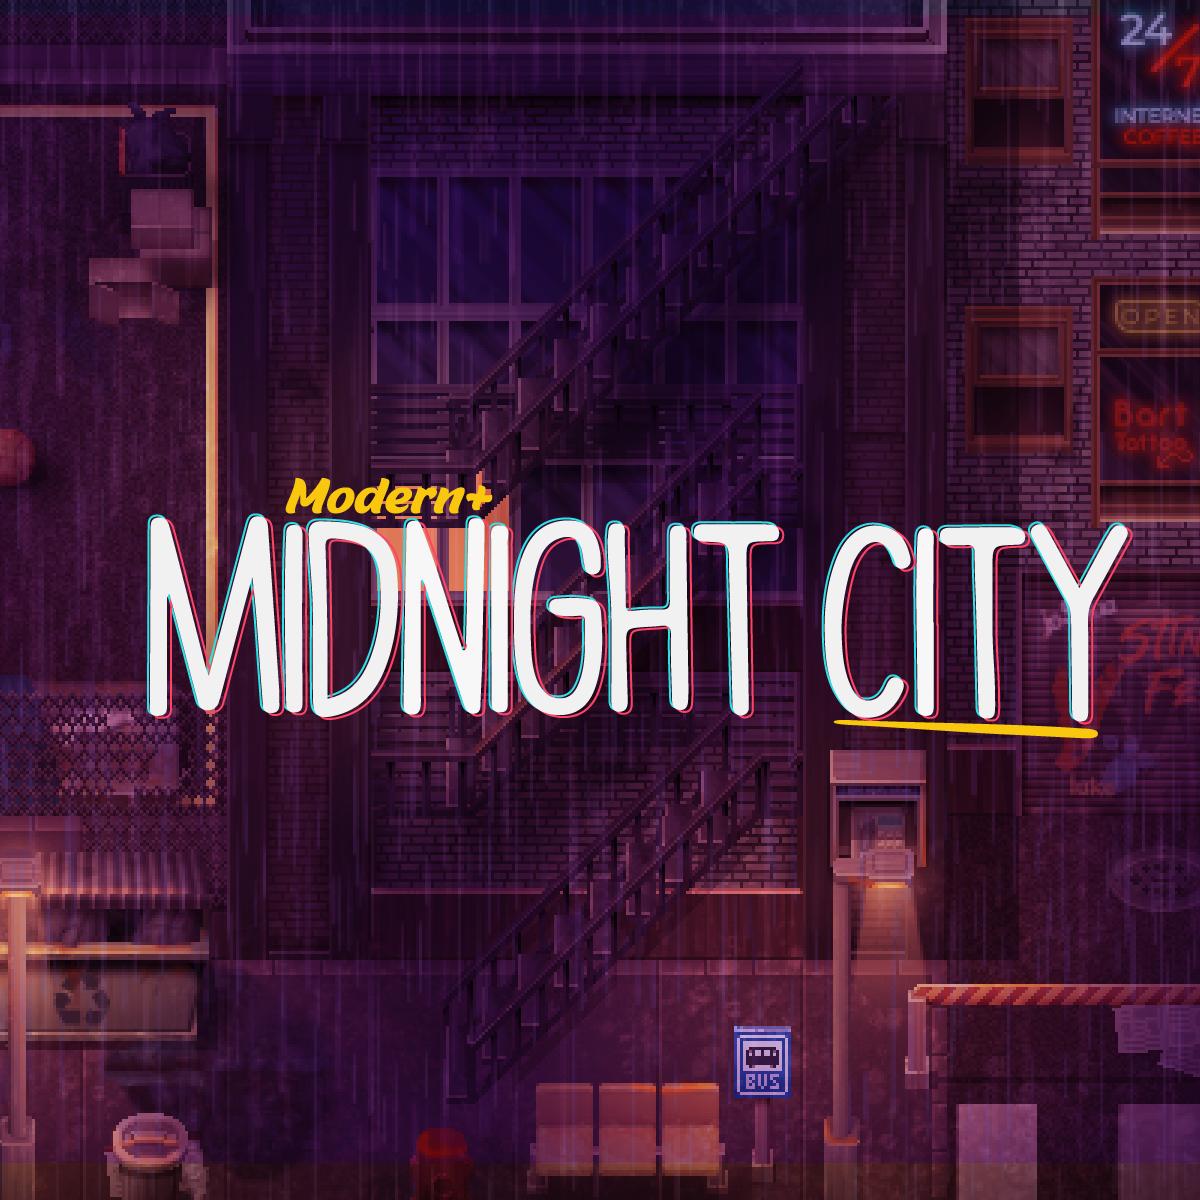 midnight-city-banners-rmw